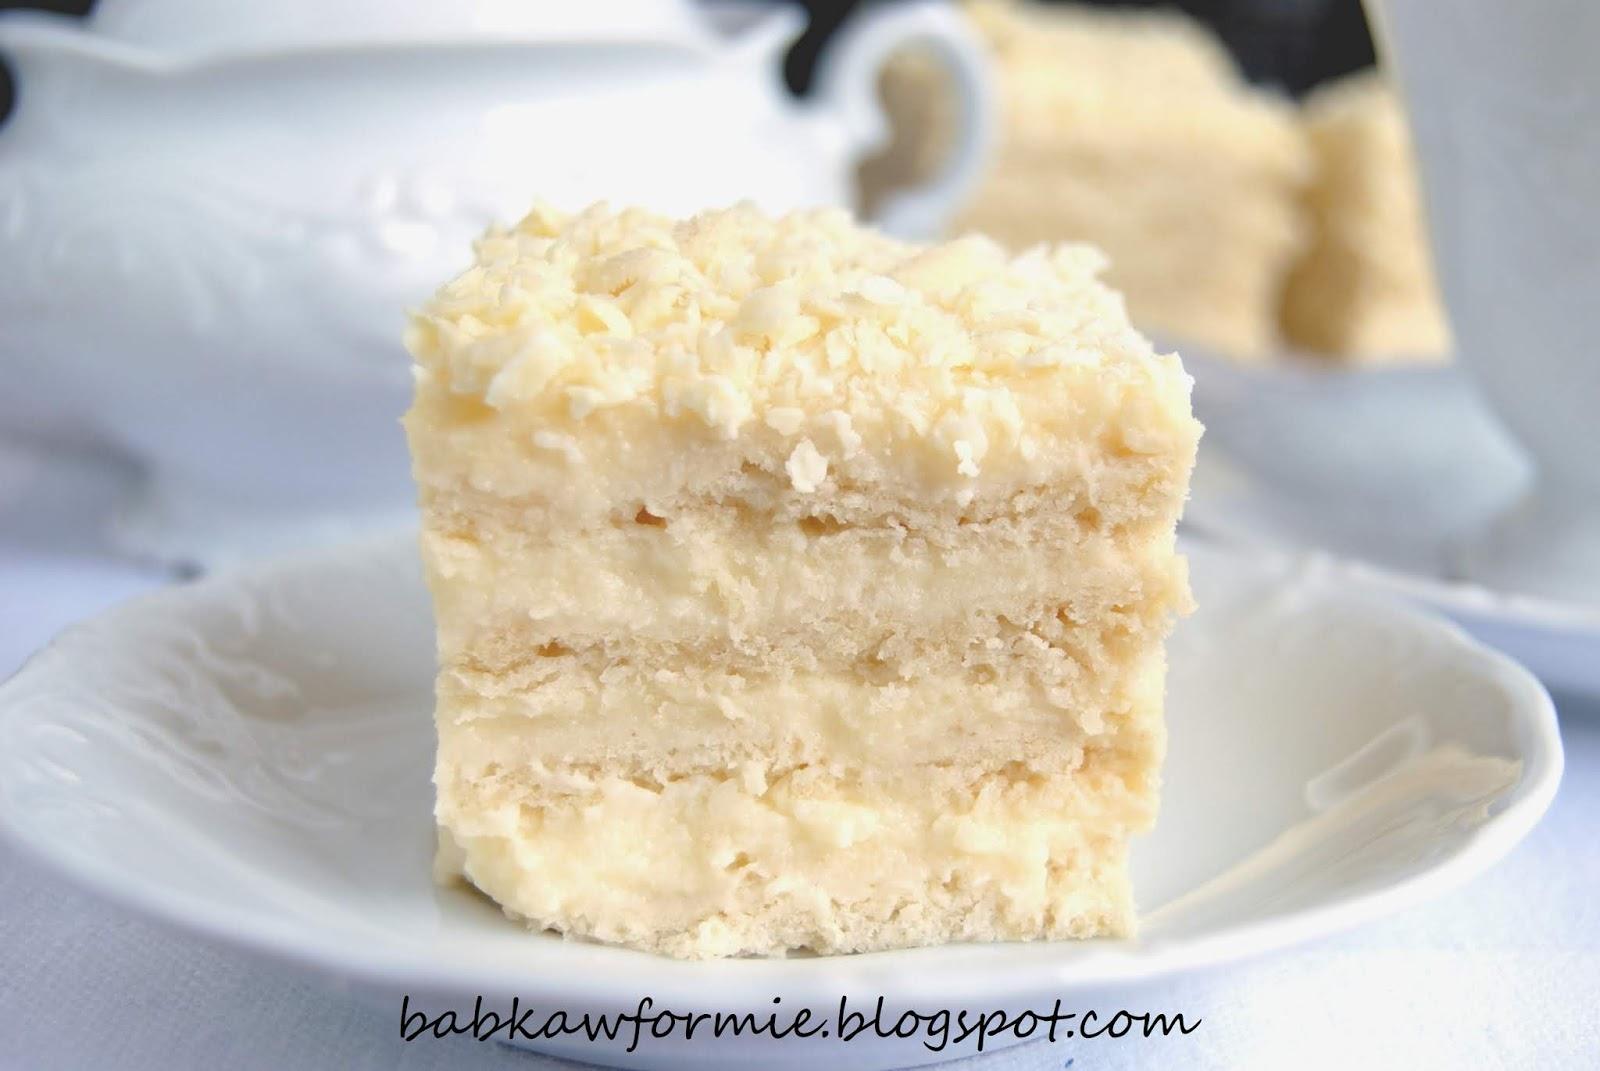 ciasto aniołek babkawformie.blogspot.com